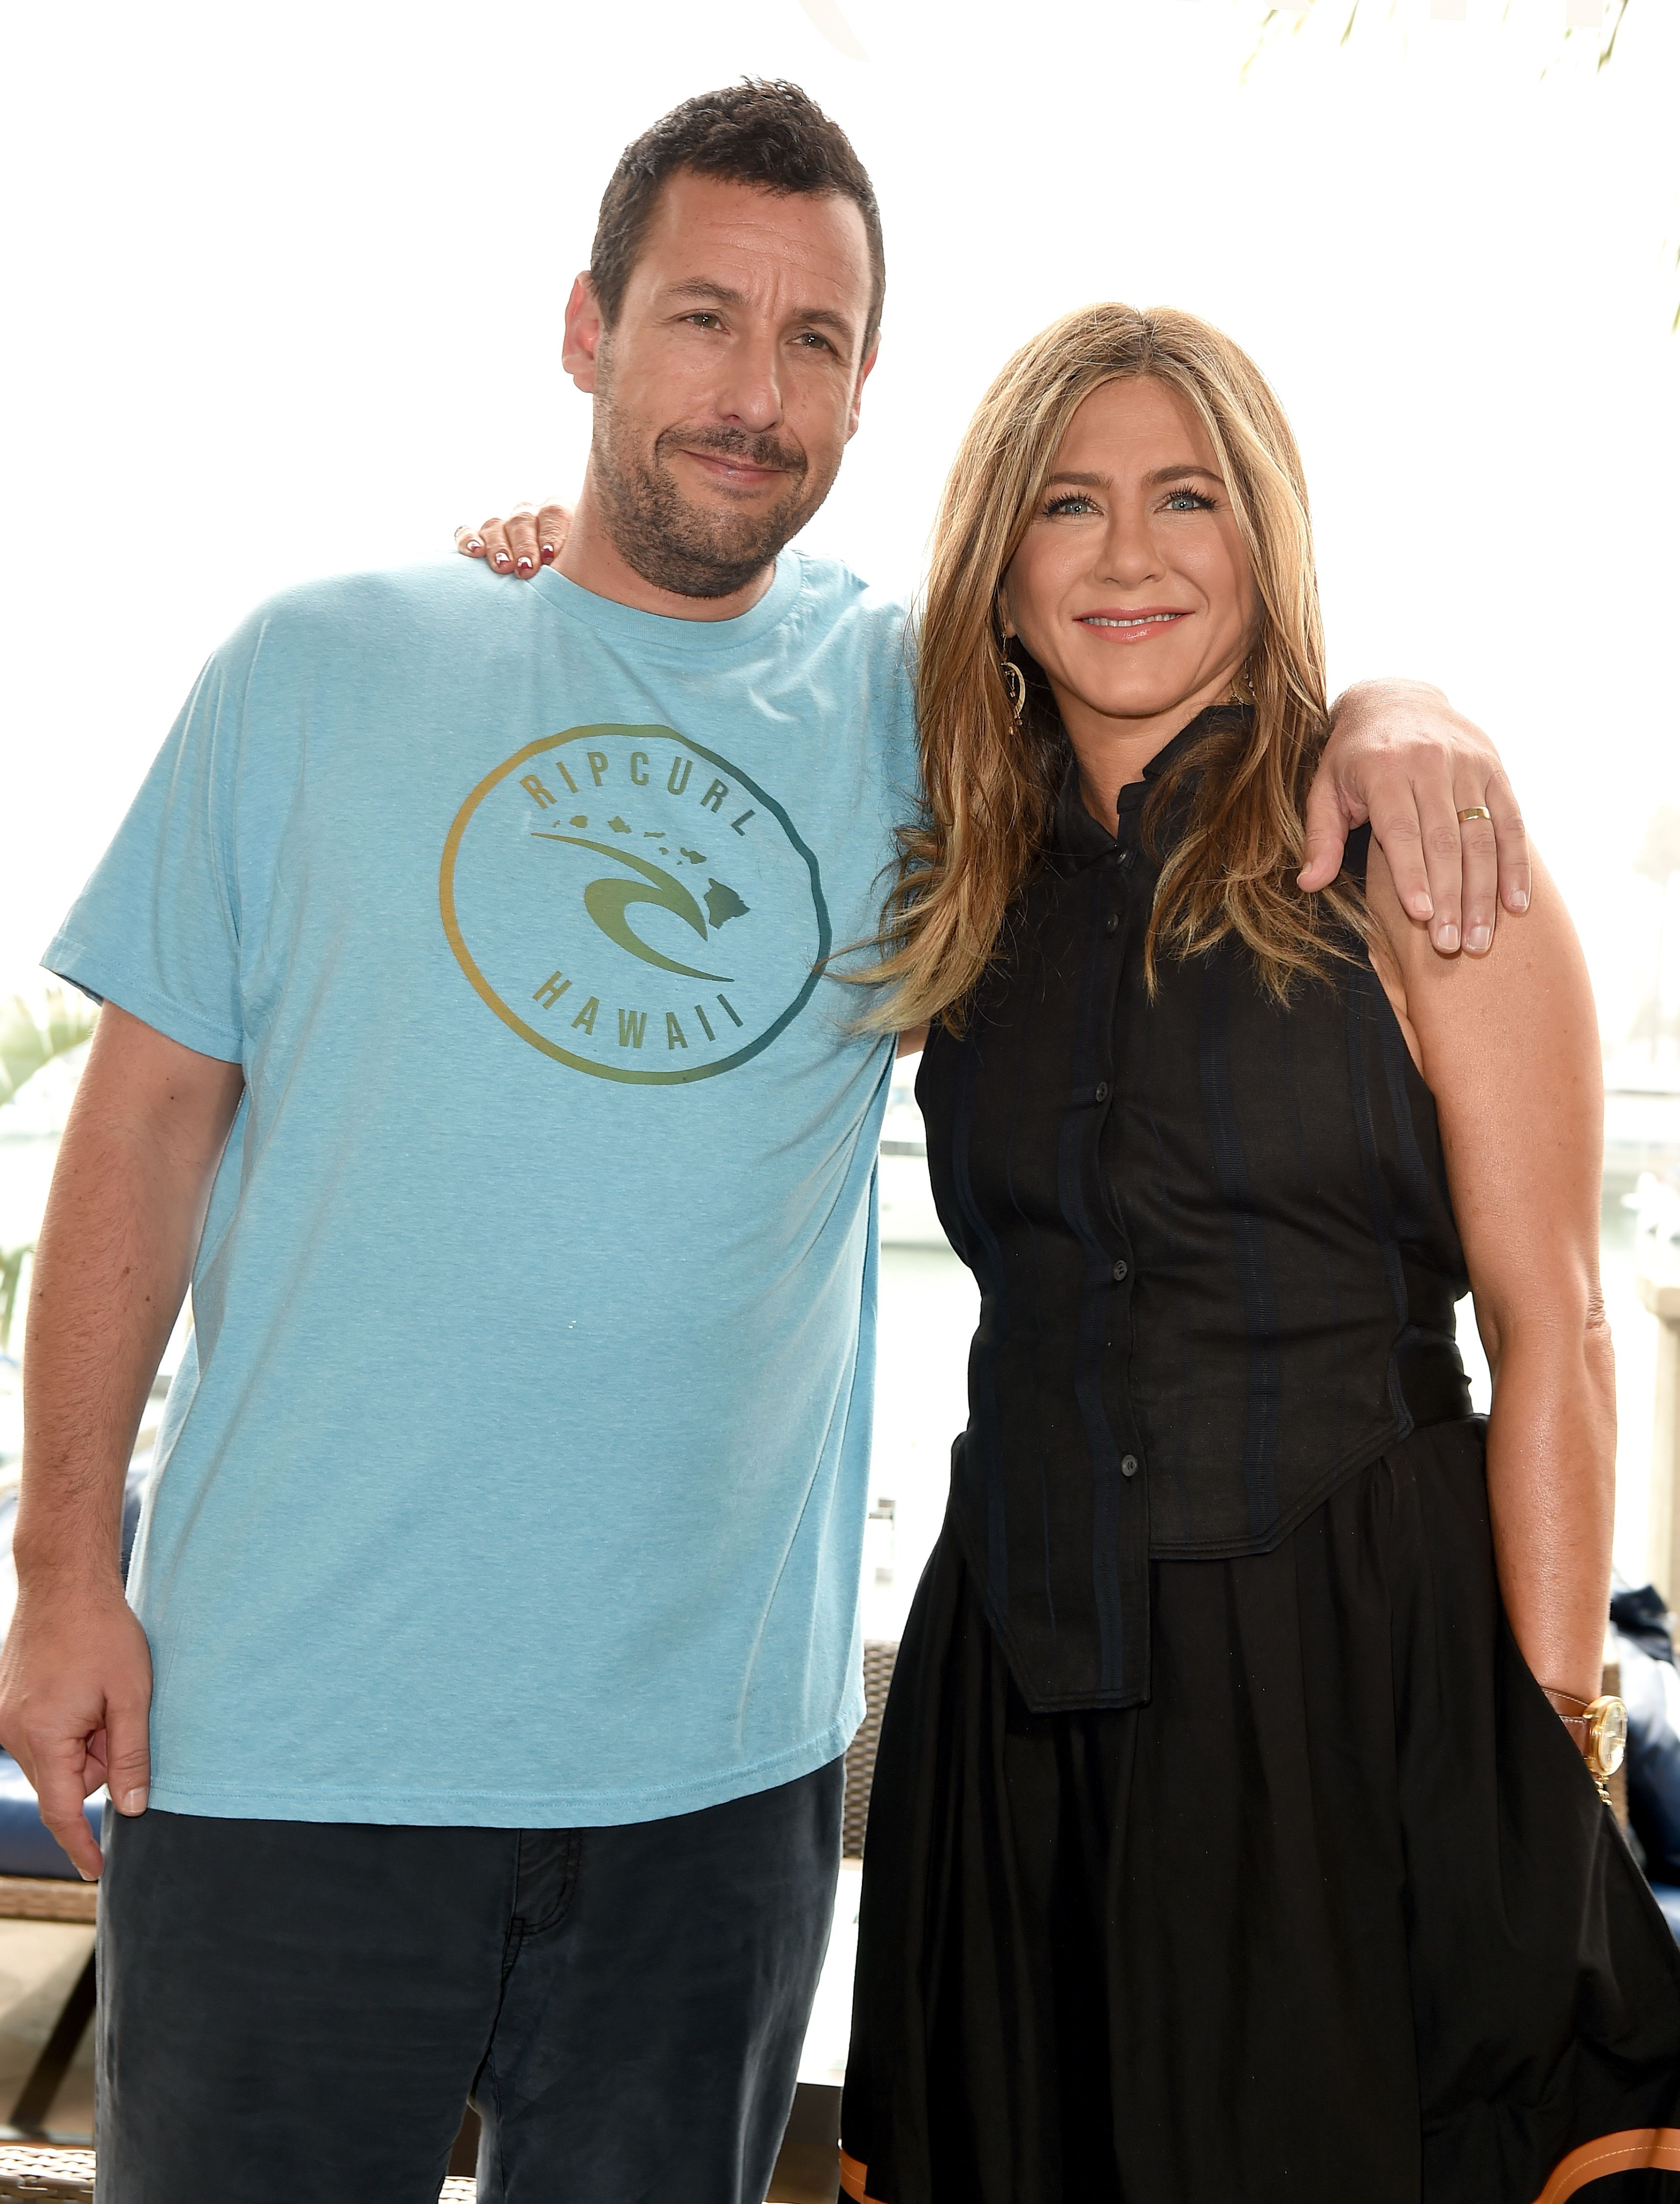 Jennifer Aniston and Adam Sandler's New Comedy 'Murder Mystery' Breaks Netflix's Opening Weekend Record